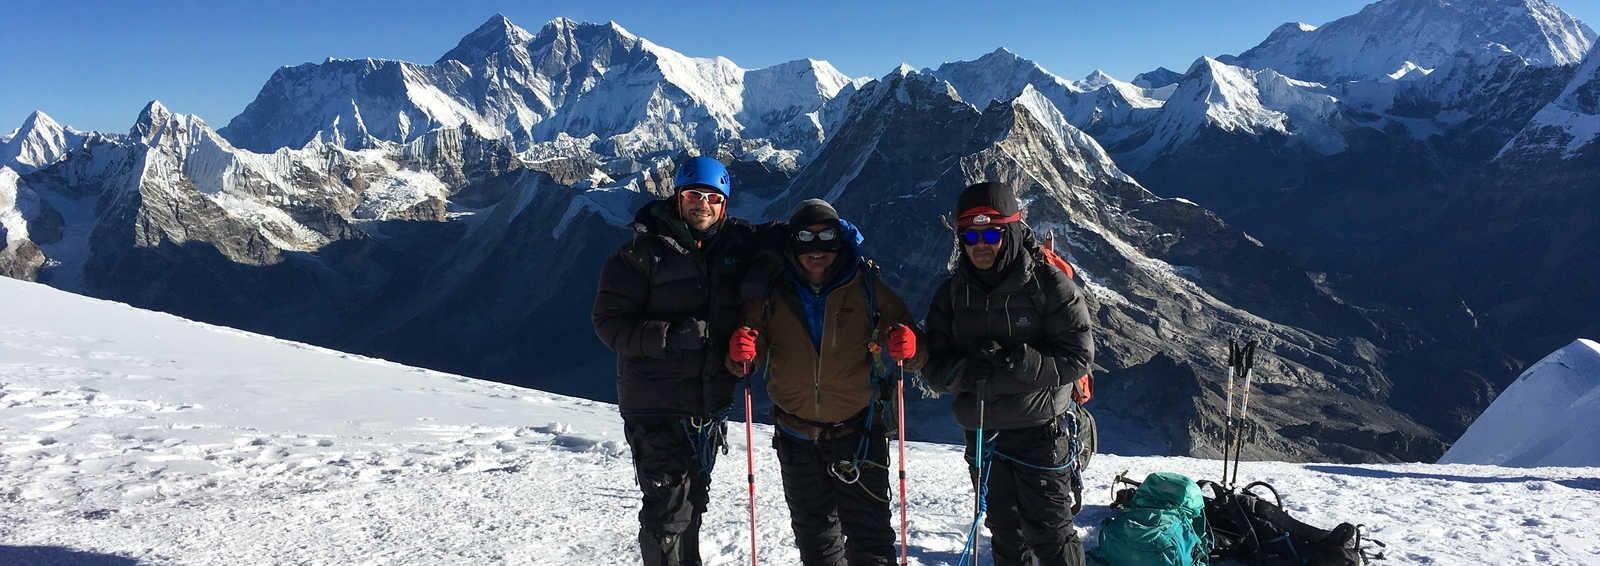 View of Everest from below Mera Peak's summit